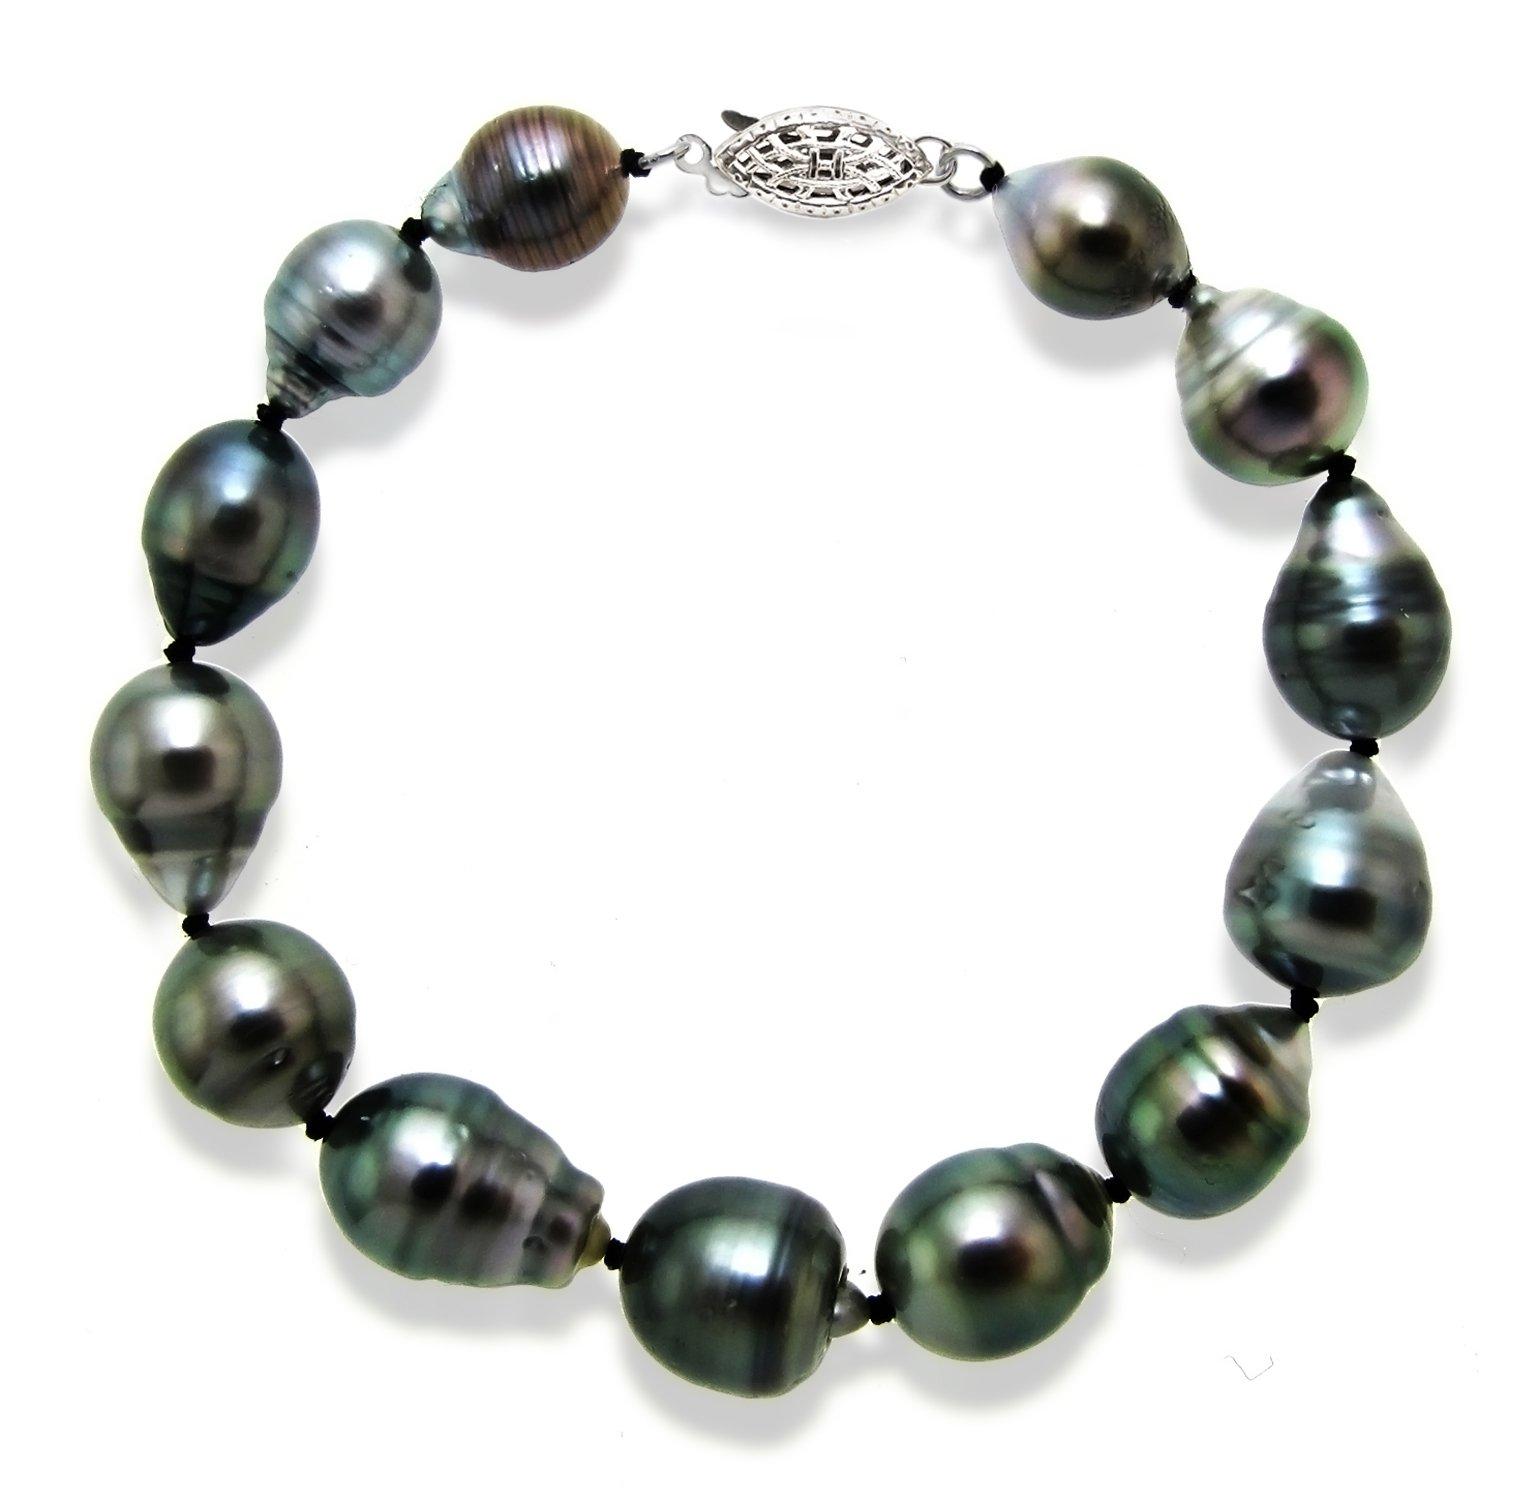 14k White Gold 8-10mm AAA Handpicked Black Baroque Tahitian Cultured Pearl Bracelet, 7.5''